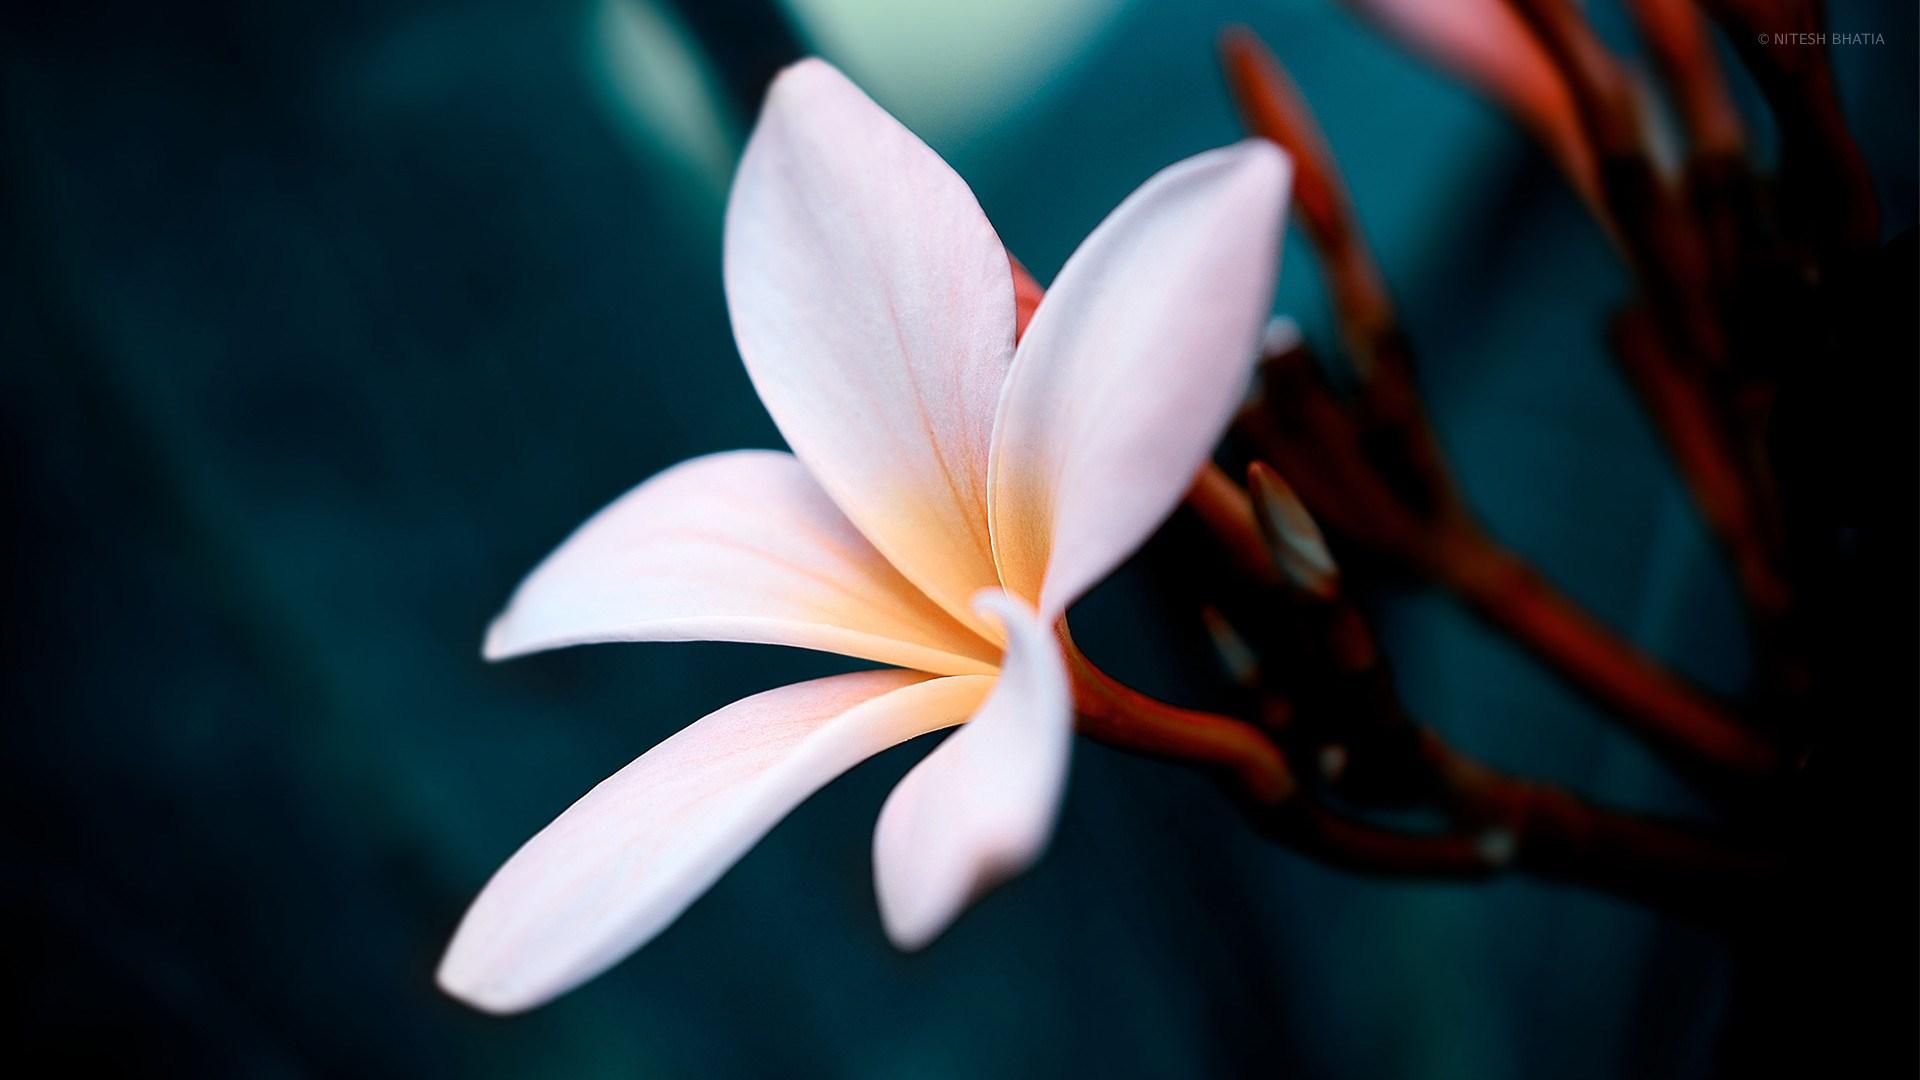 White Plumeria Flower Close Up Desktop Wallpaper